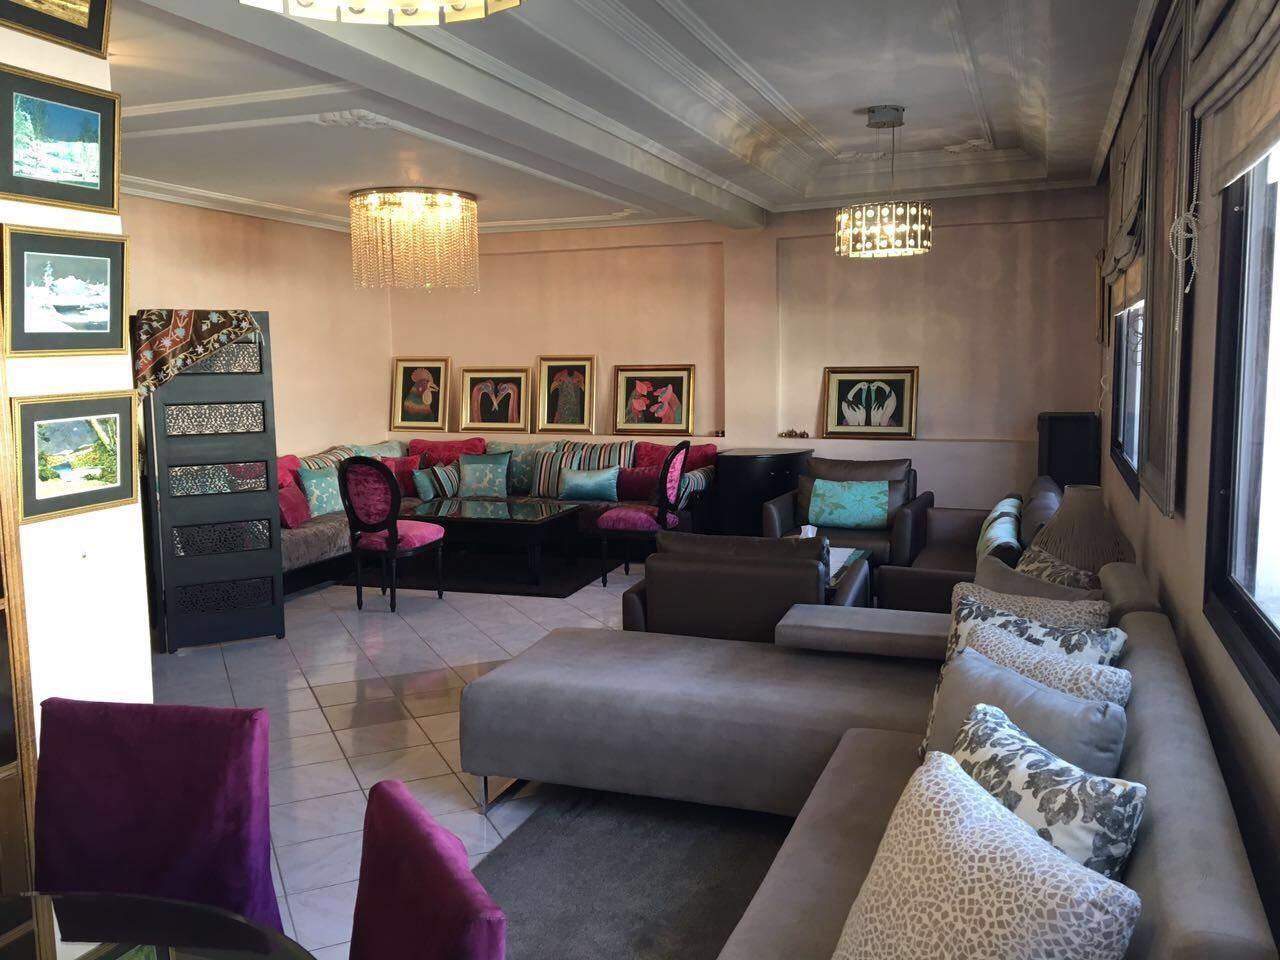 Vente <strong>Appartement</strong> Casablanca Les Princesses <strong>151 m2</strong>